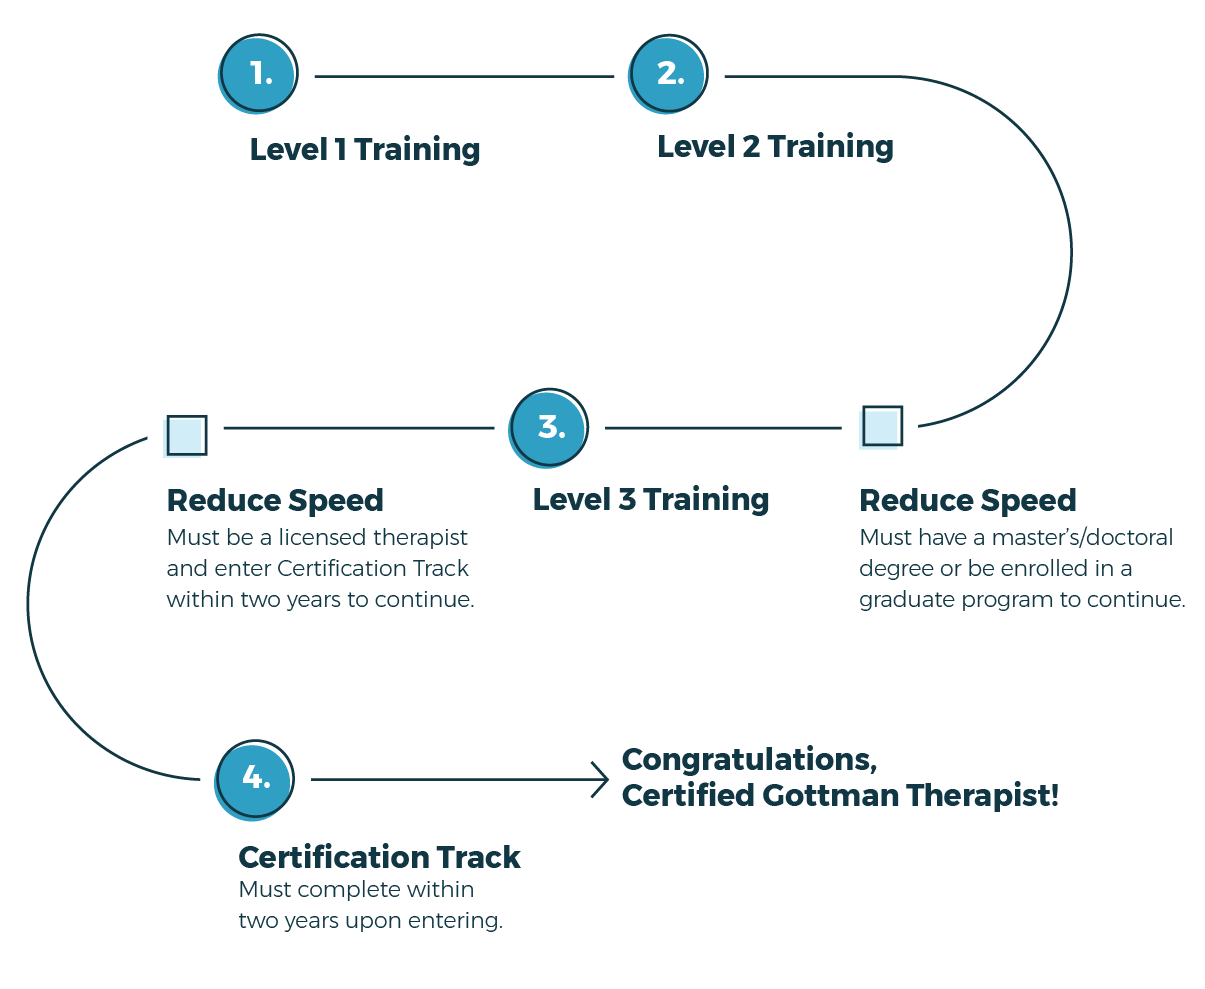 Roadmap To Certification